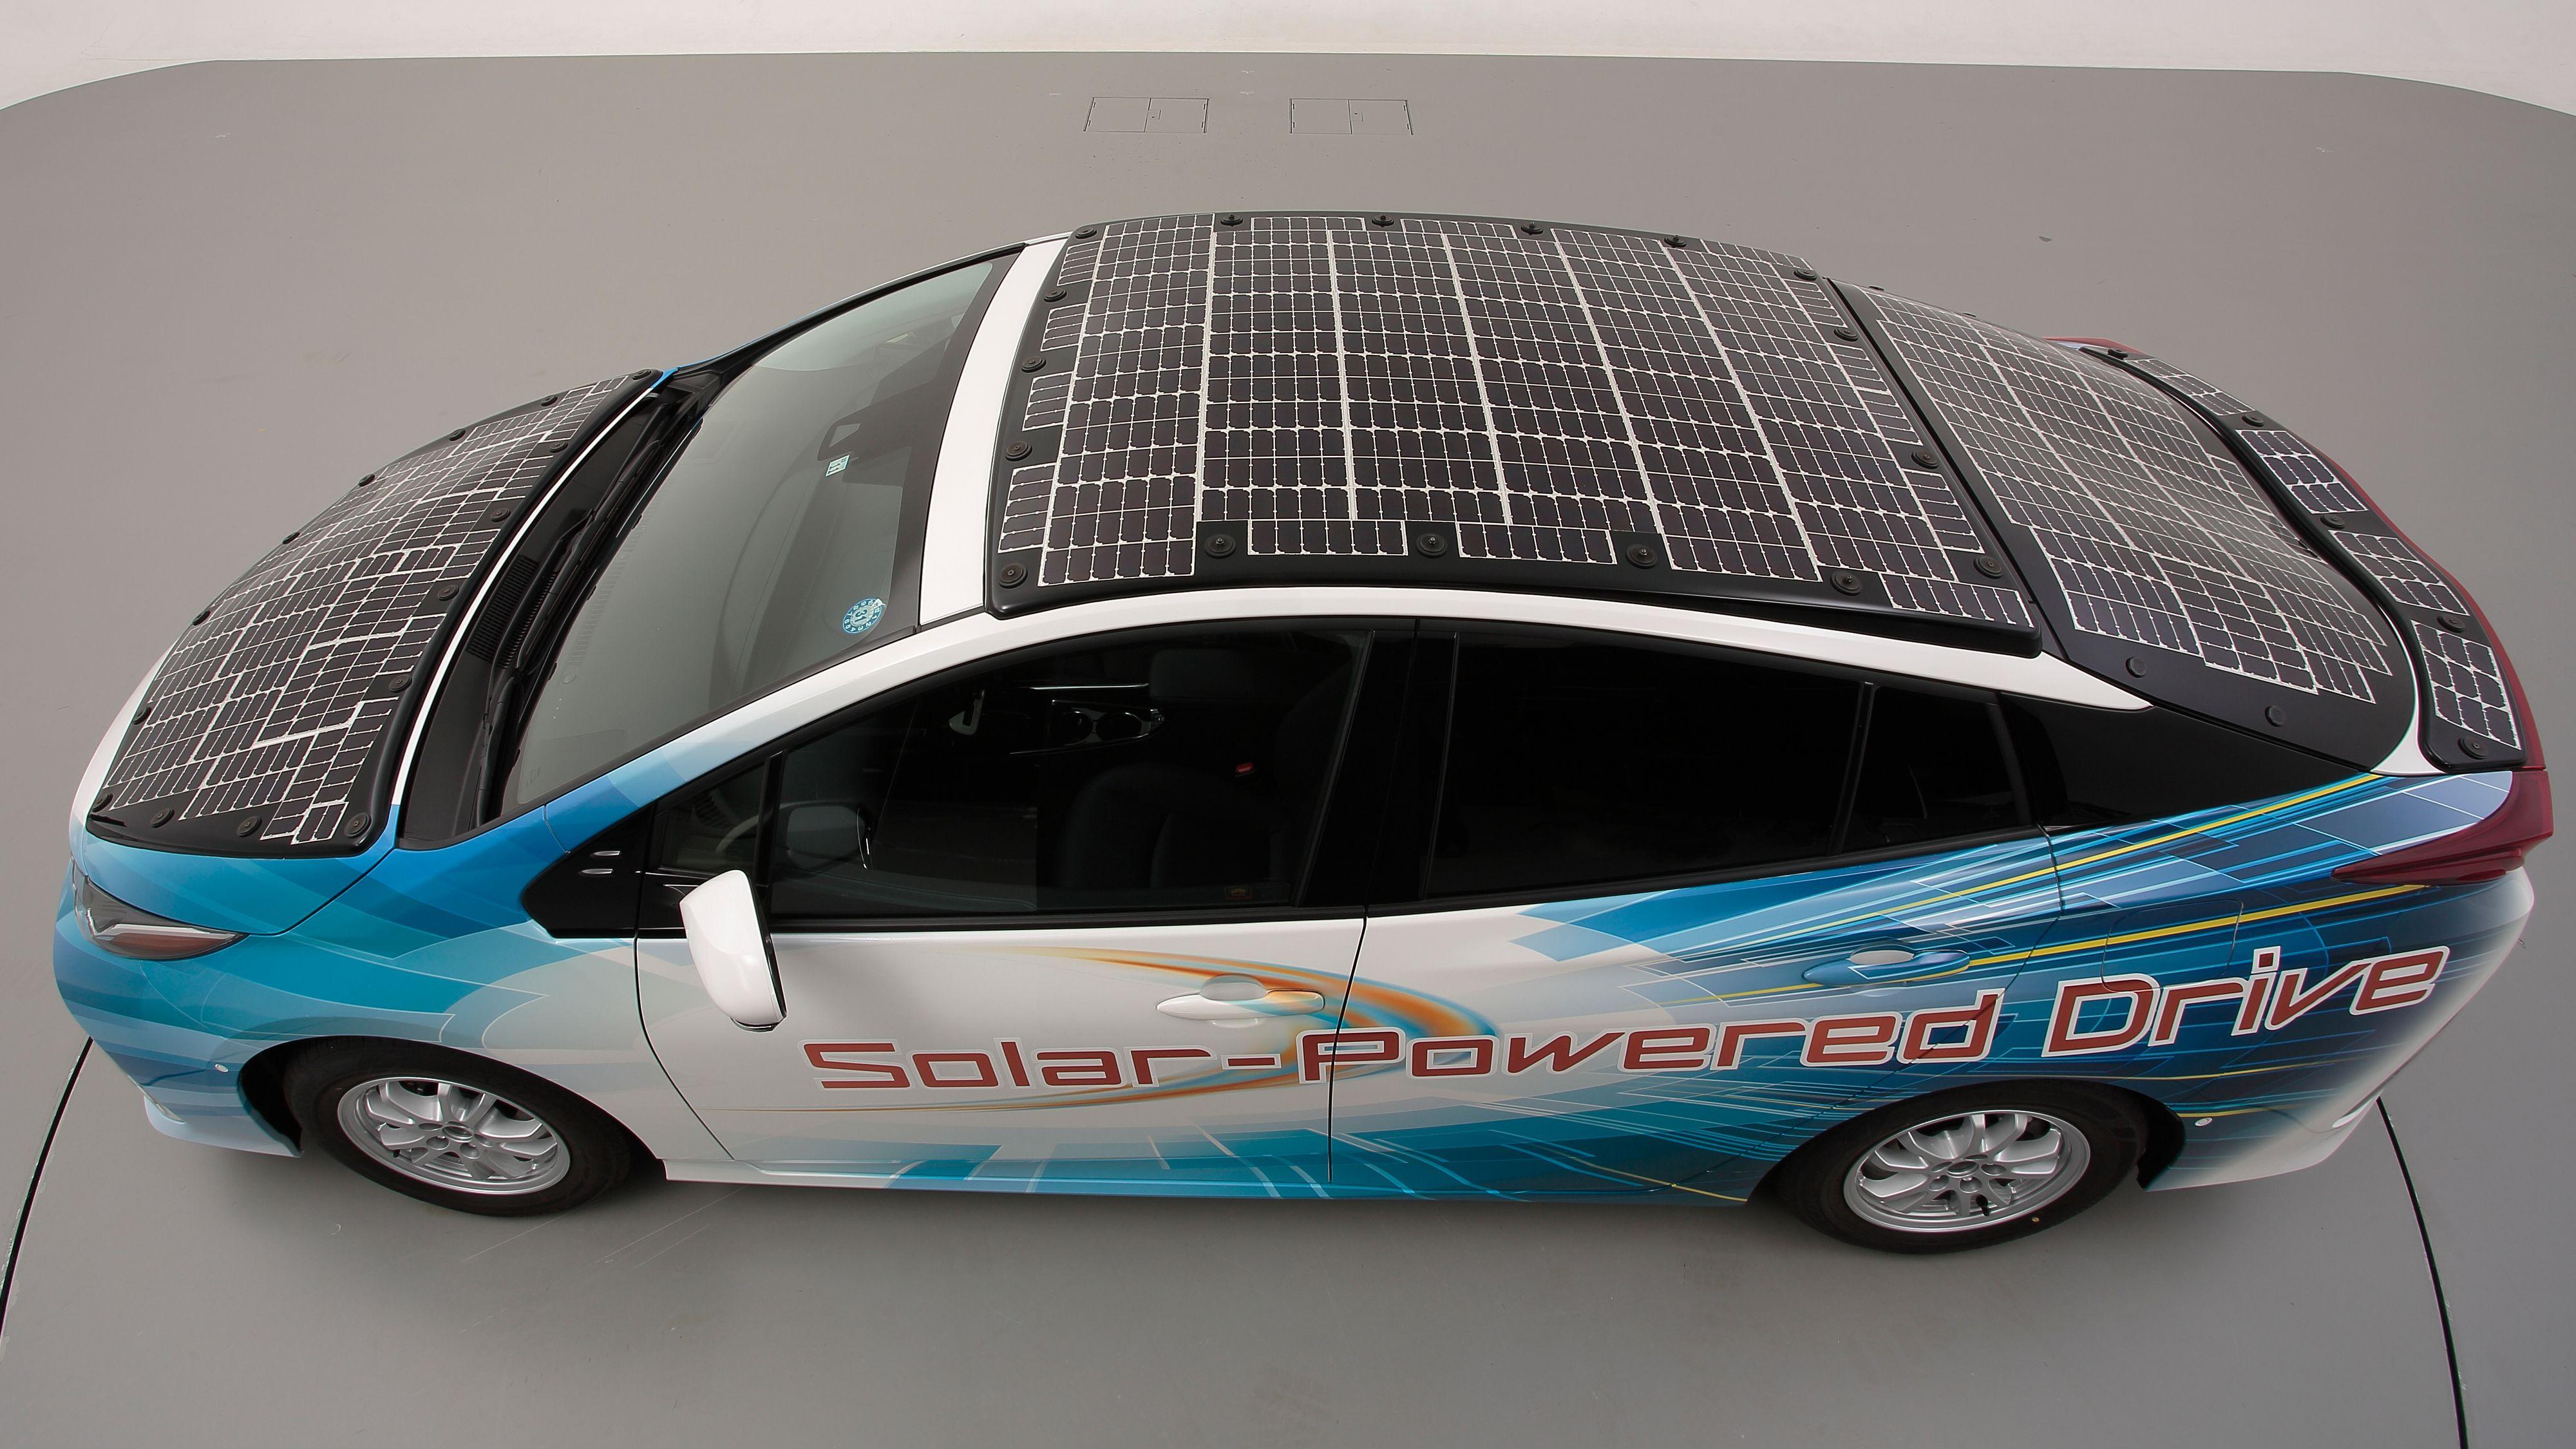 Toyotas konsept-Prius går 44 kilometer per dag på solkraft